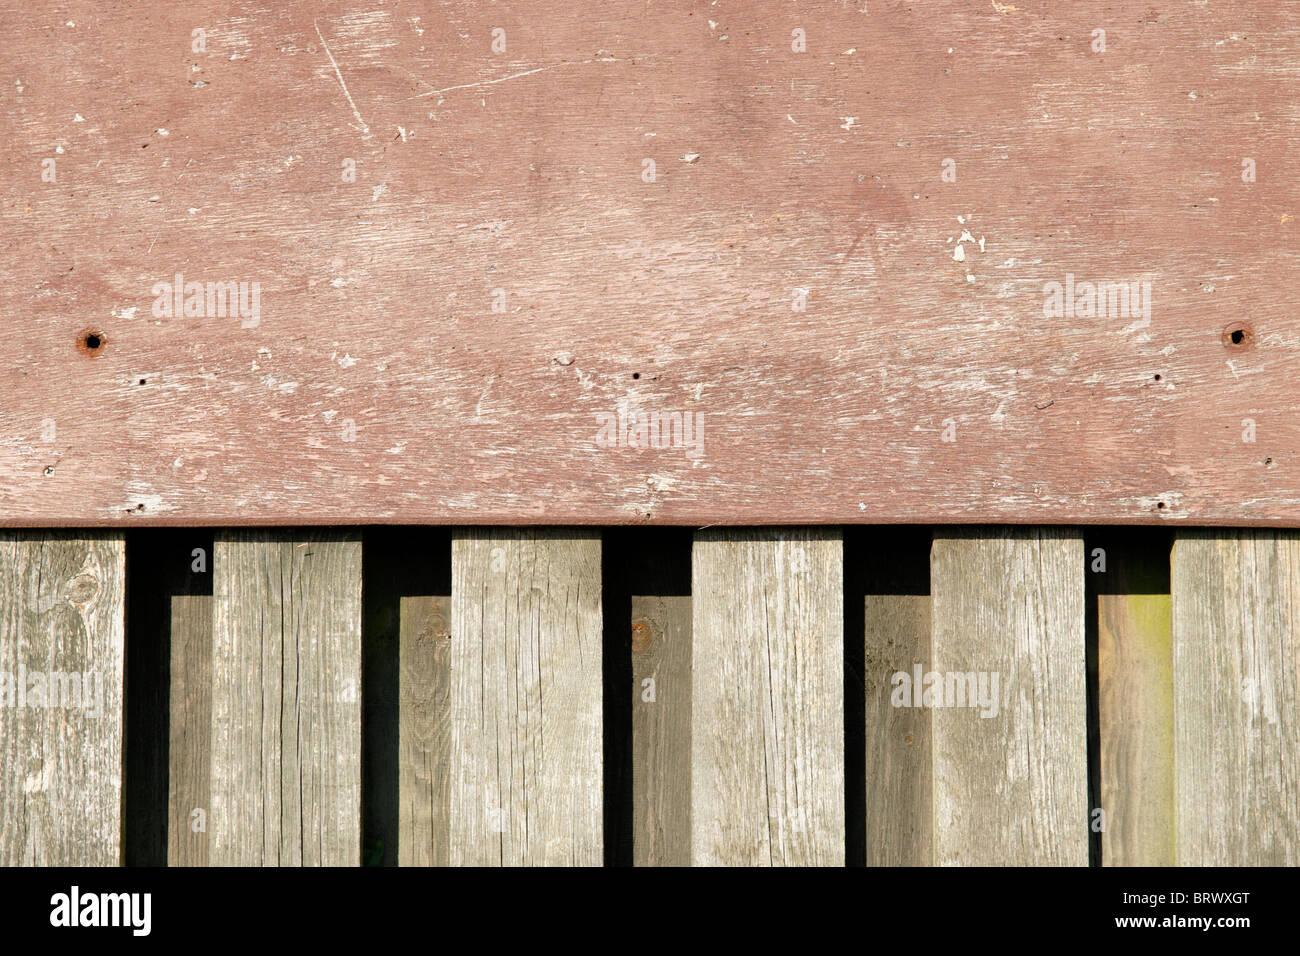 BULLETIN BOARD - Stock Image